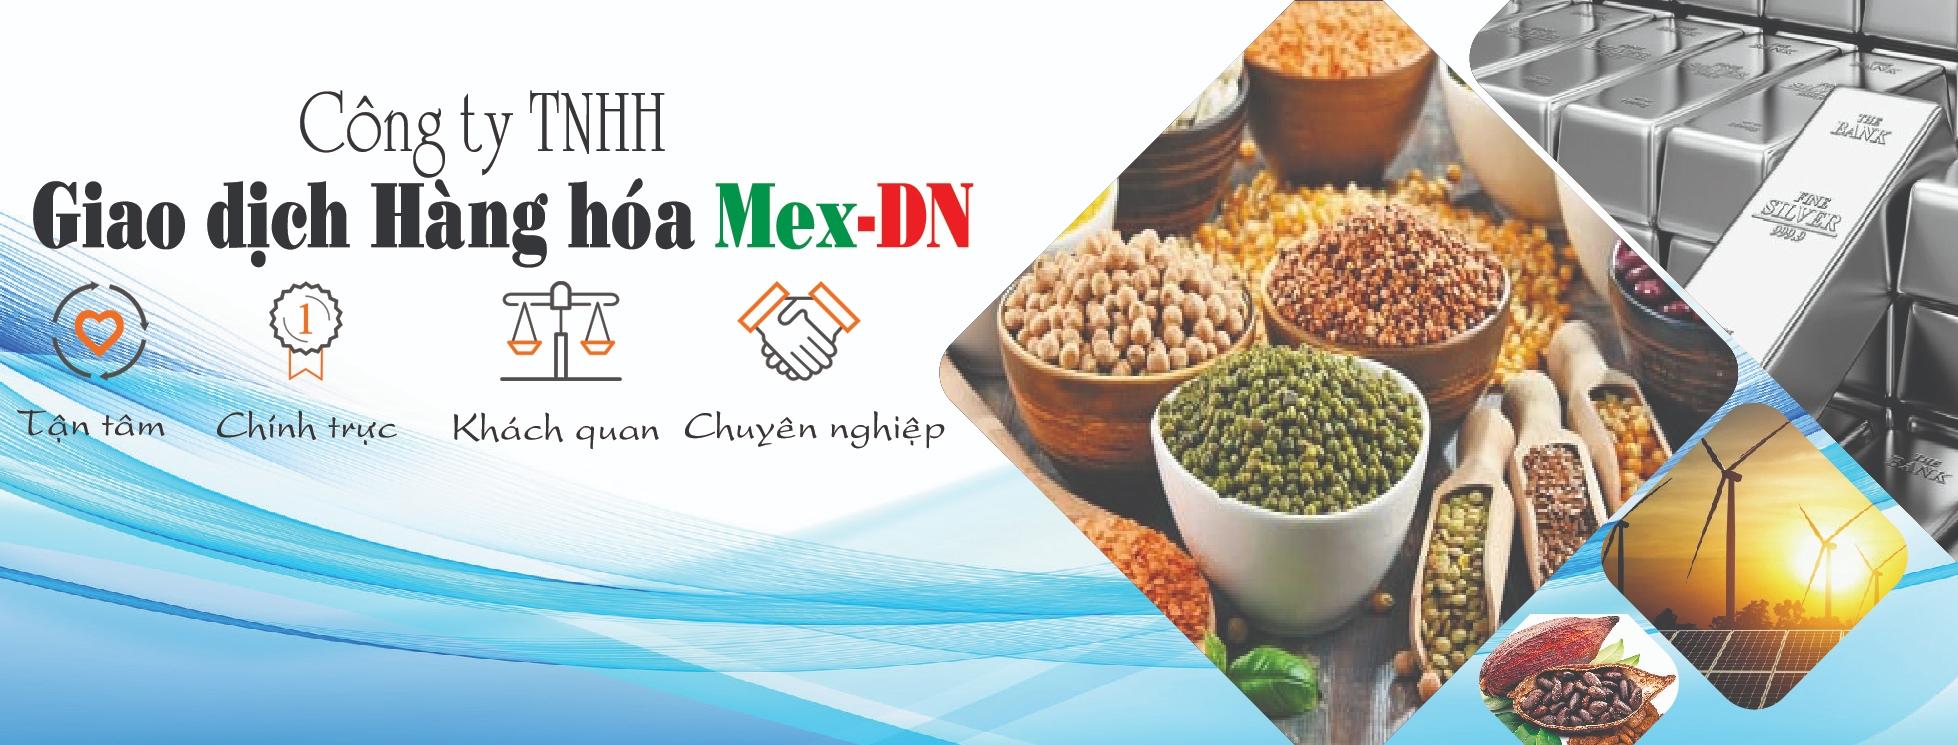 Mex-Dn (@mexdn) Cover Image